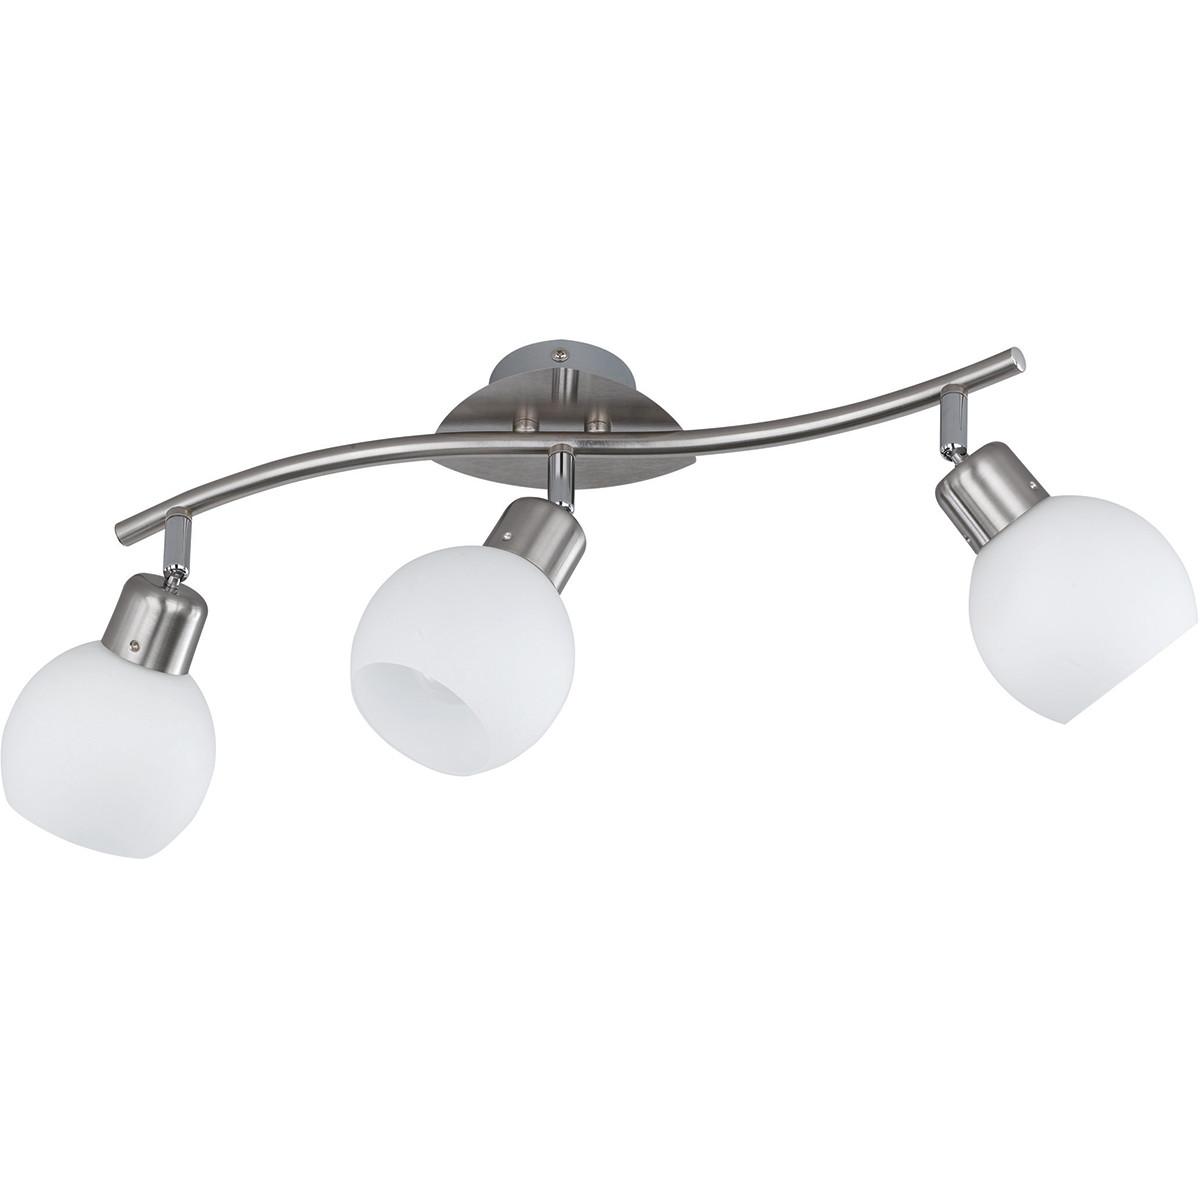 LED Plafondspot - Trion Frudo - 12W - E14 Fitting - Warm Wit 3000K - 3-lichts - Rond - Mat Nikkel -